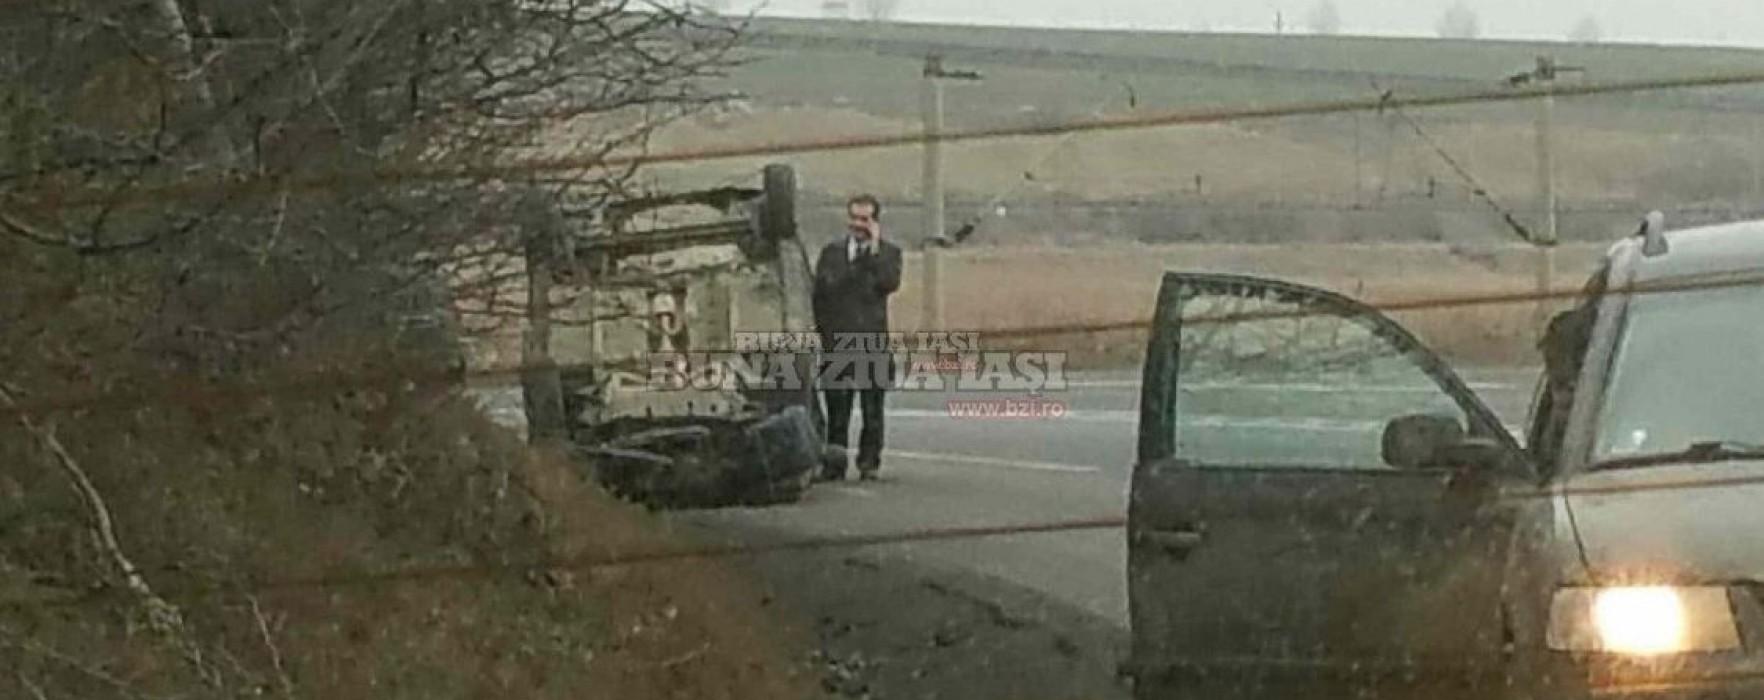 Copreşedintele PNL Dâmboviţa Ludovic Orban s-a răsturnat cu maşina